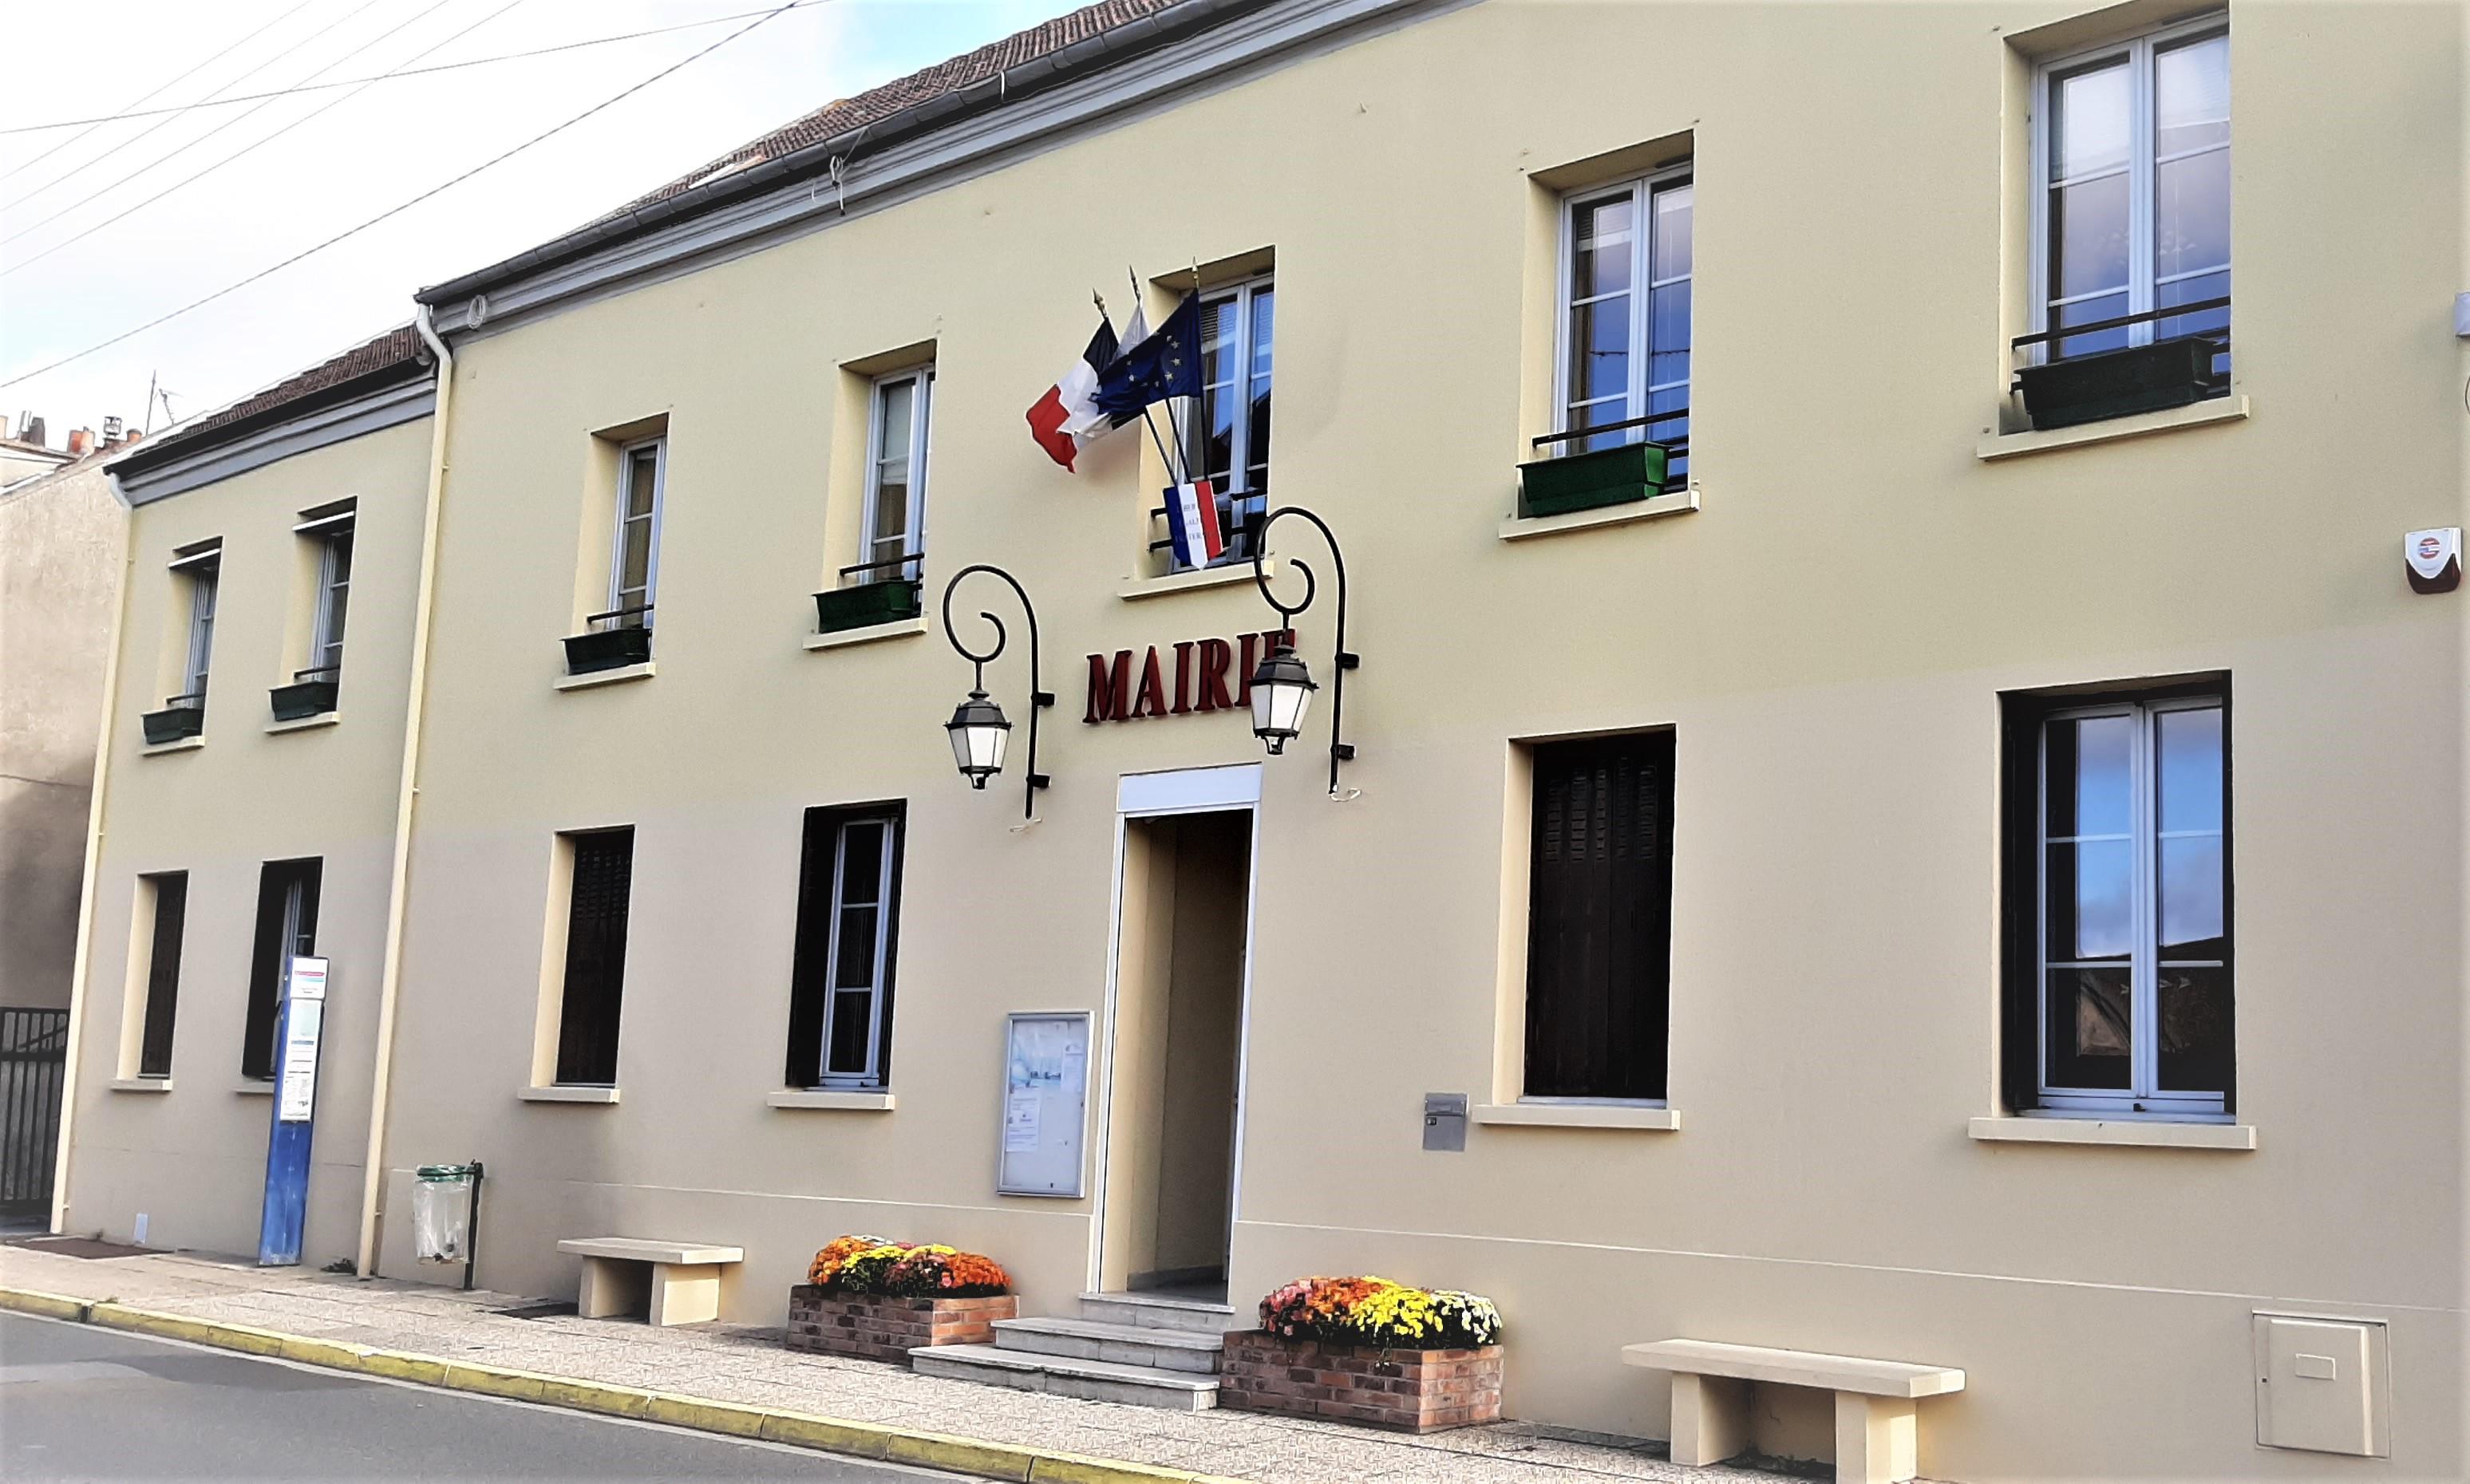 façade de la mairie de Bruyeres-sur-oise